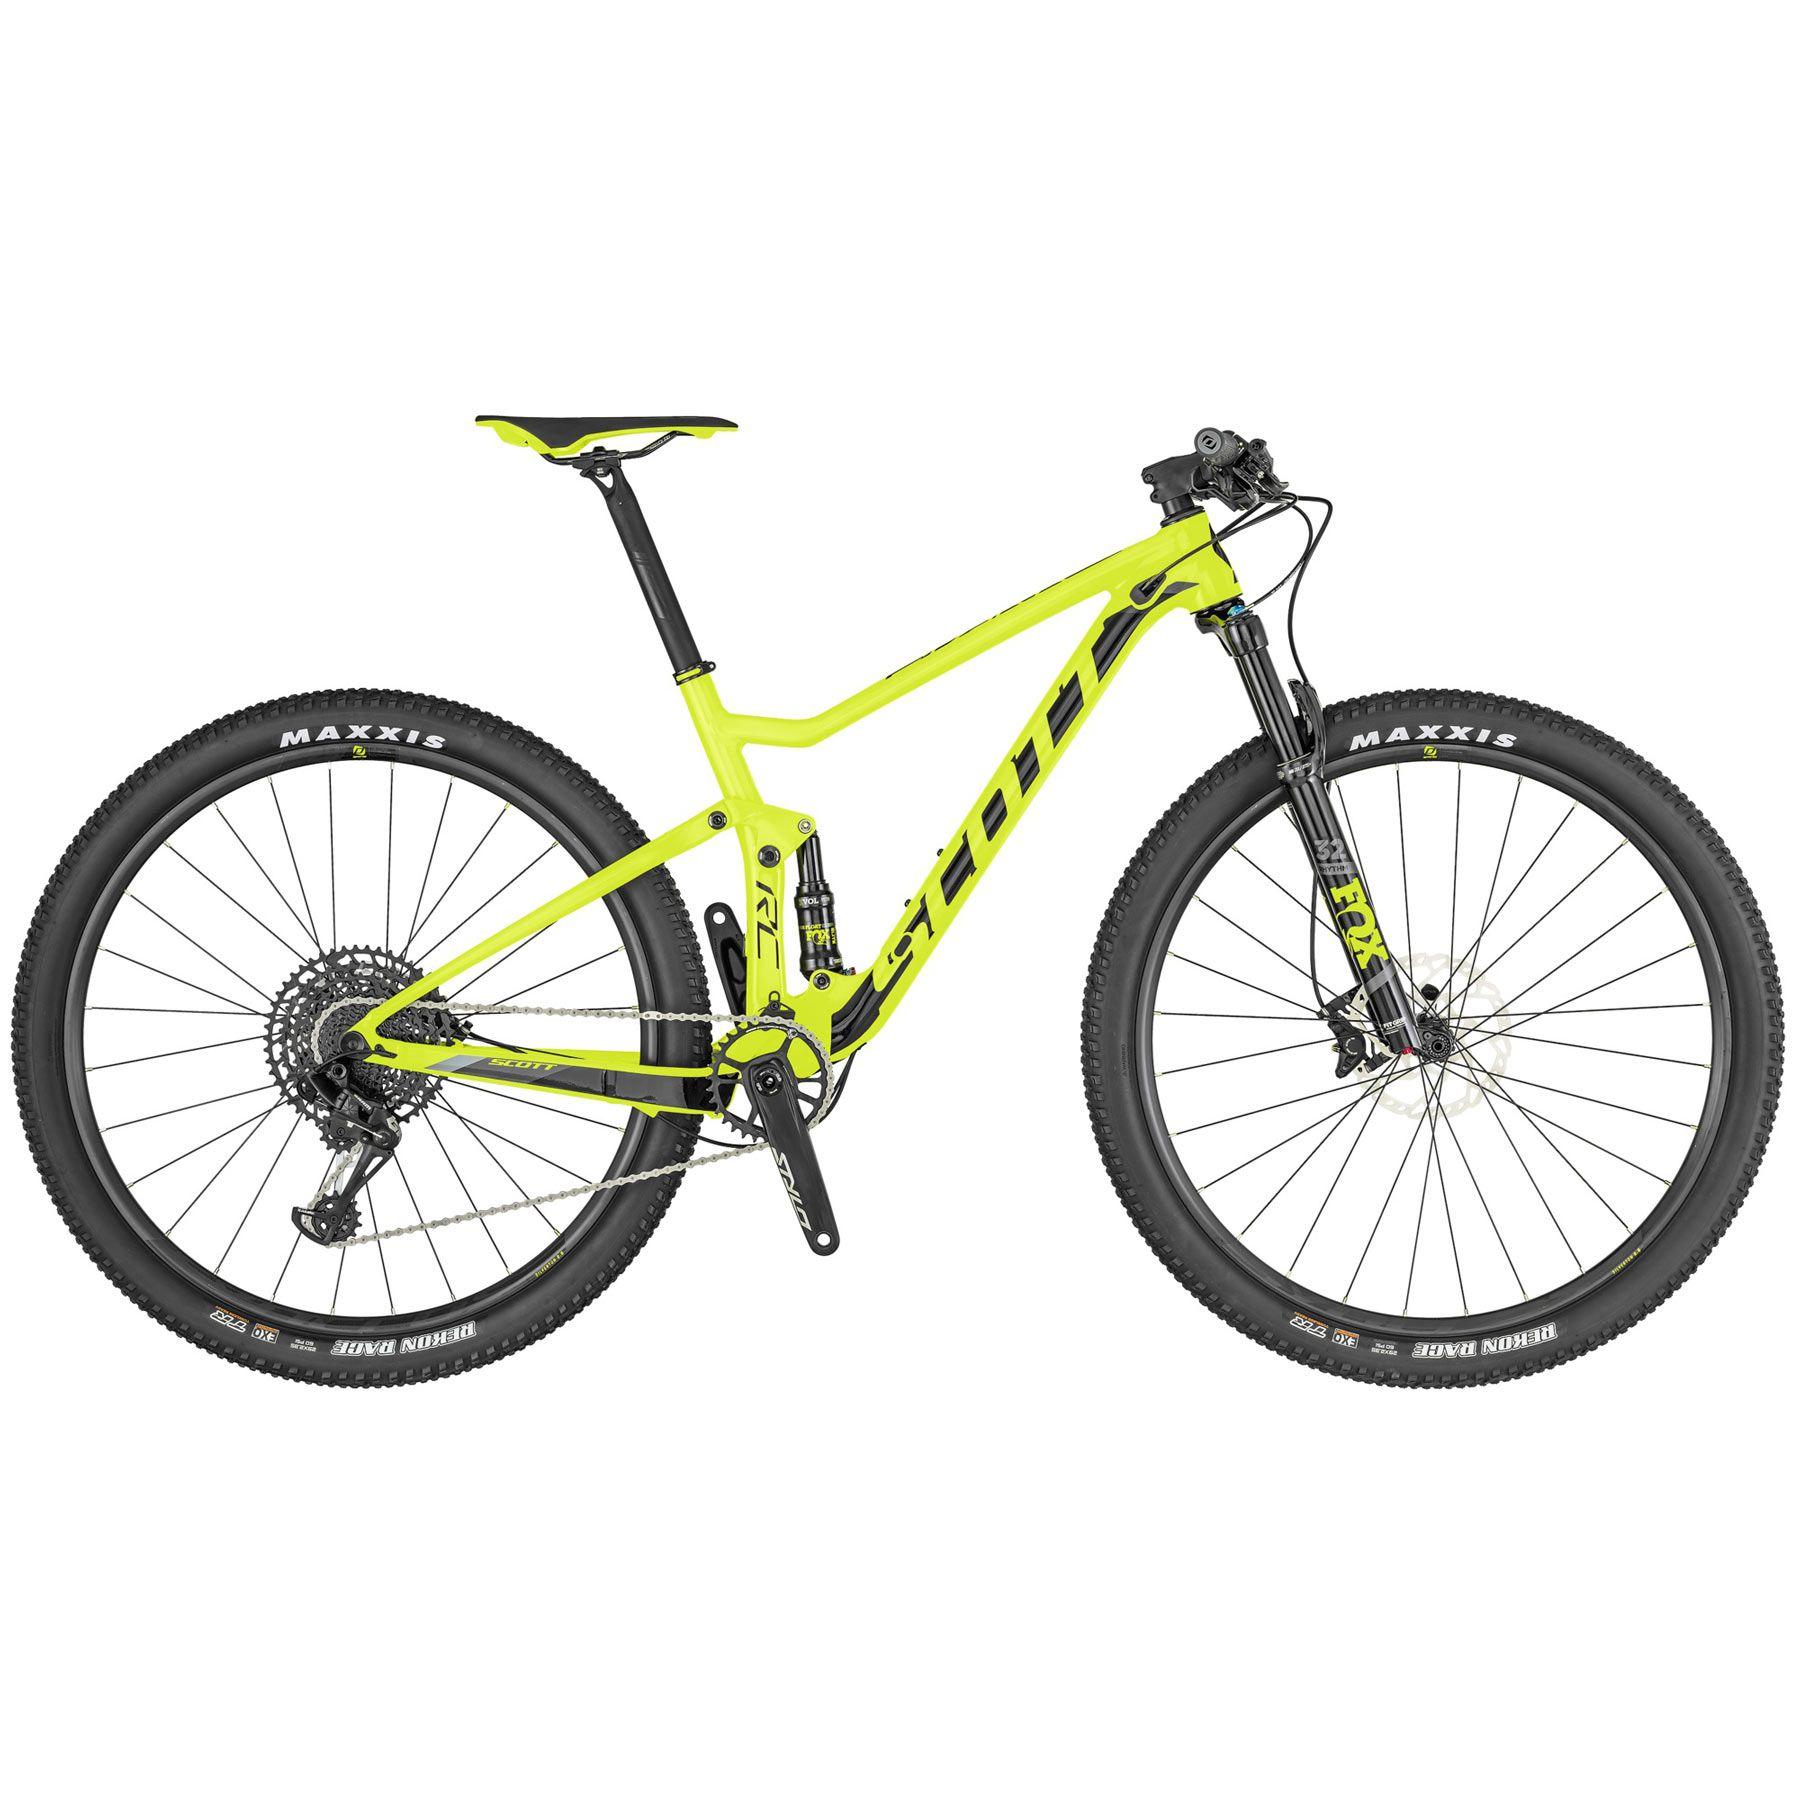 Bicicleta Scott Spark RC 900 Comp Aro 29